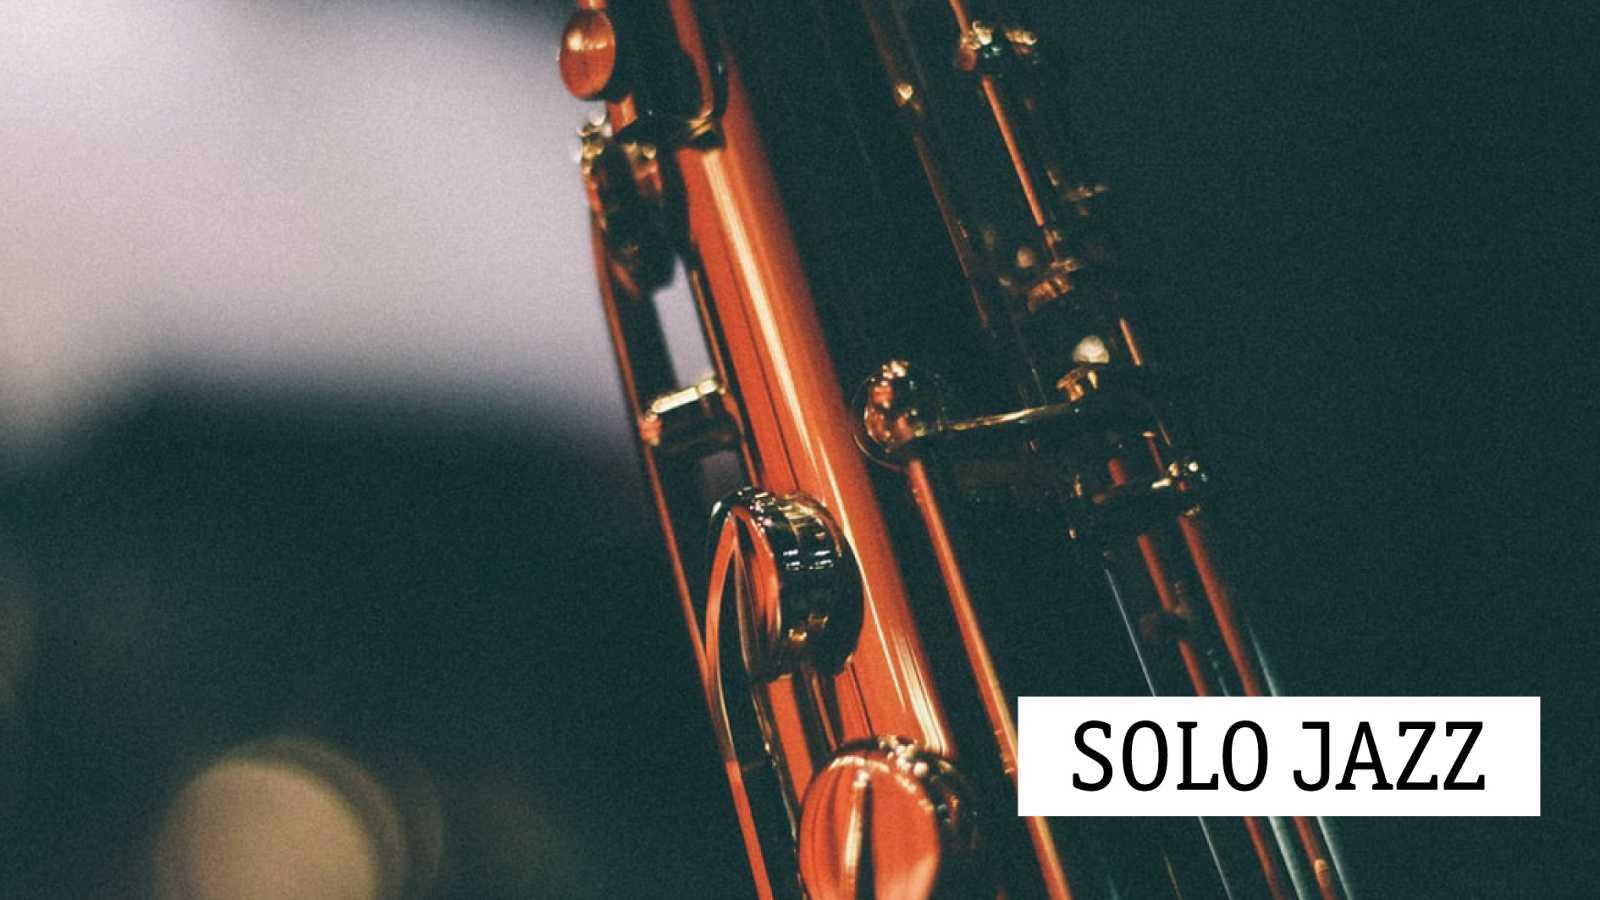 Solo jazz - Gary Peacock, un contrabajista con alas - 05/10/20 - escuchar ahora